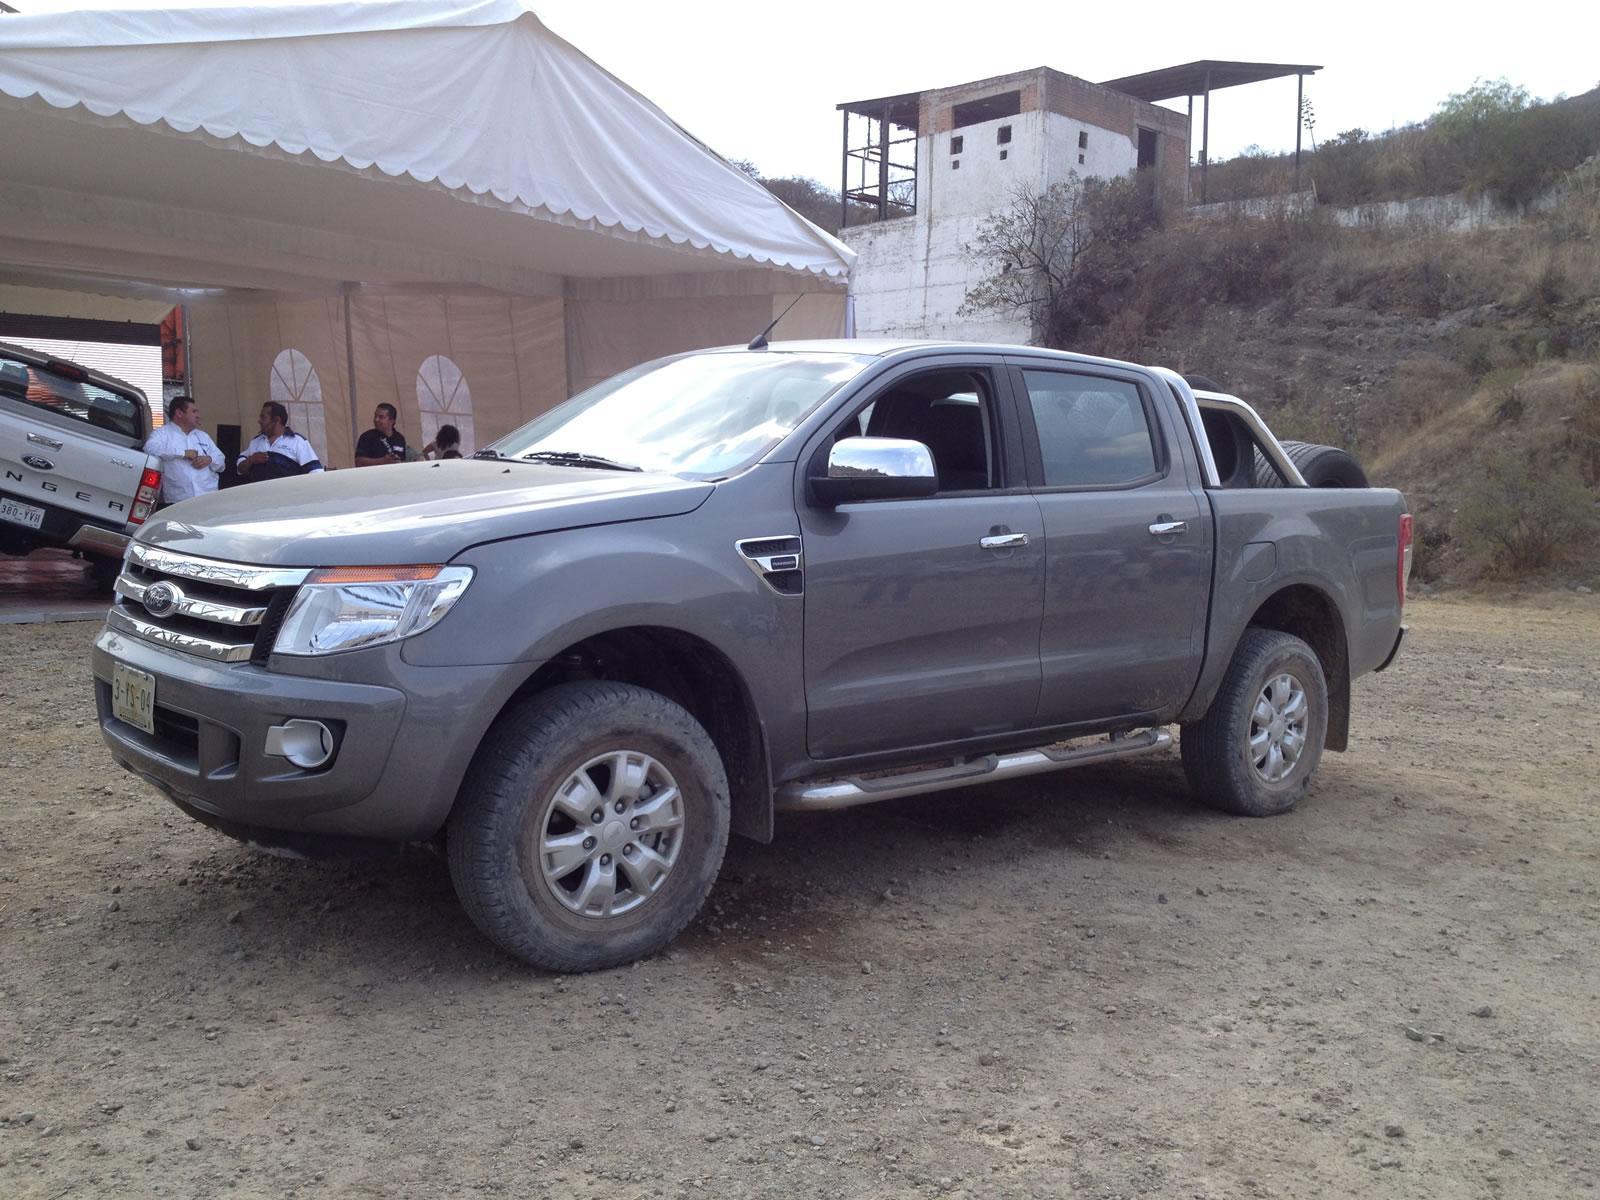 Toyota Hilux Diesel 2016 - Ford Ranger 2013 llega a México desde $284,000 pesos ...